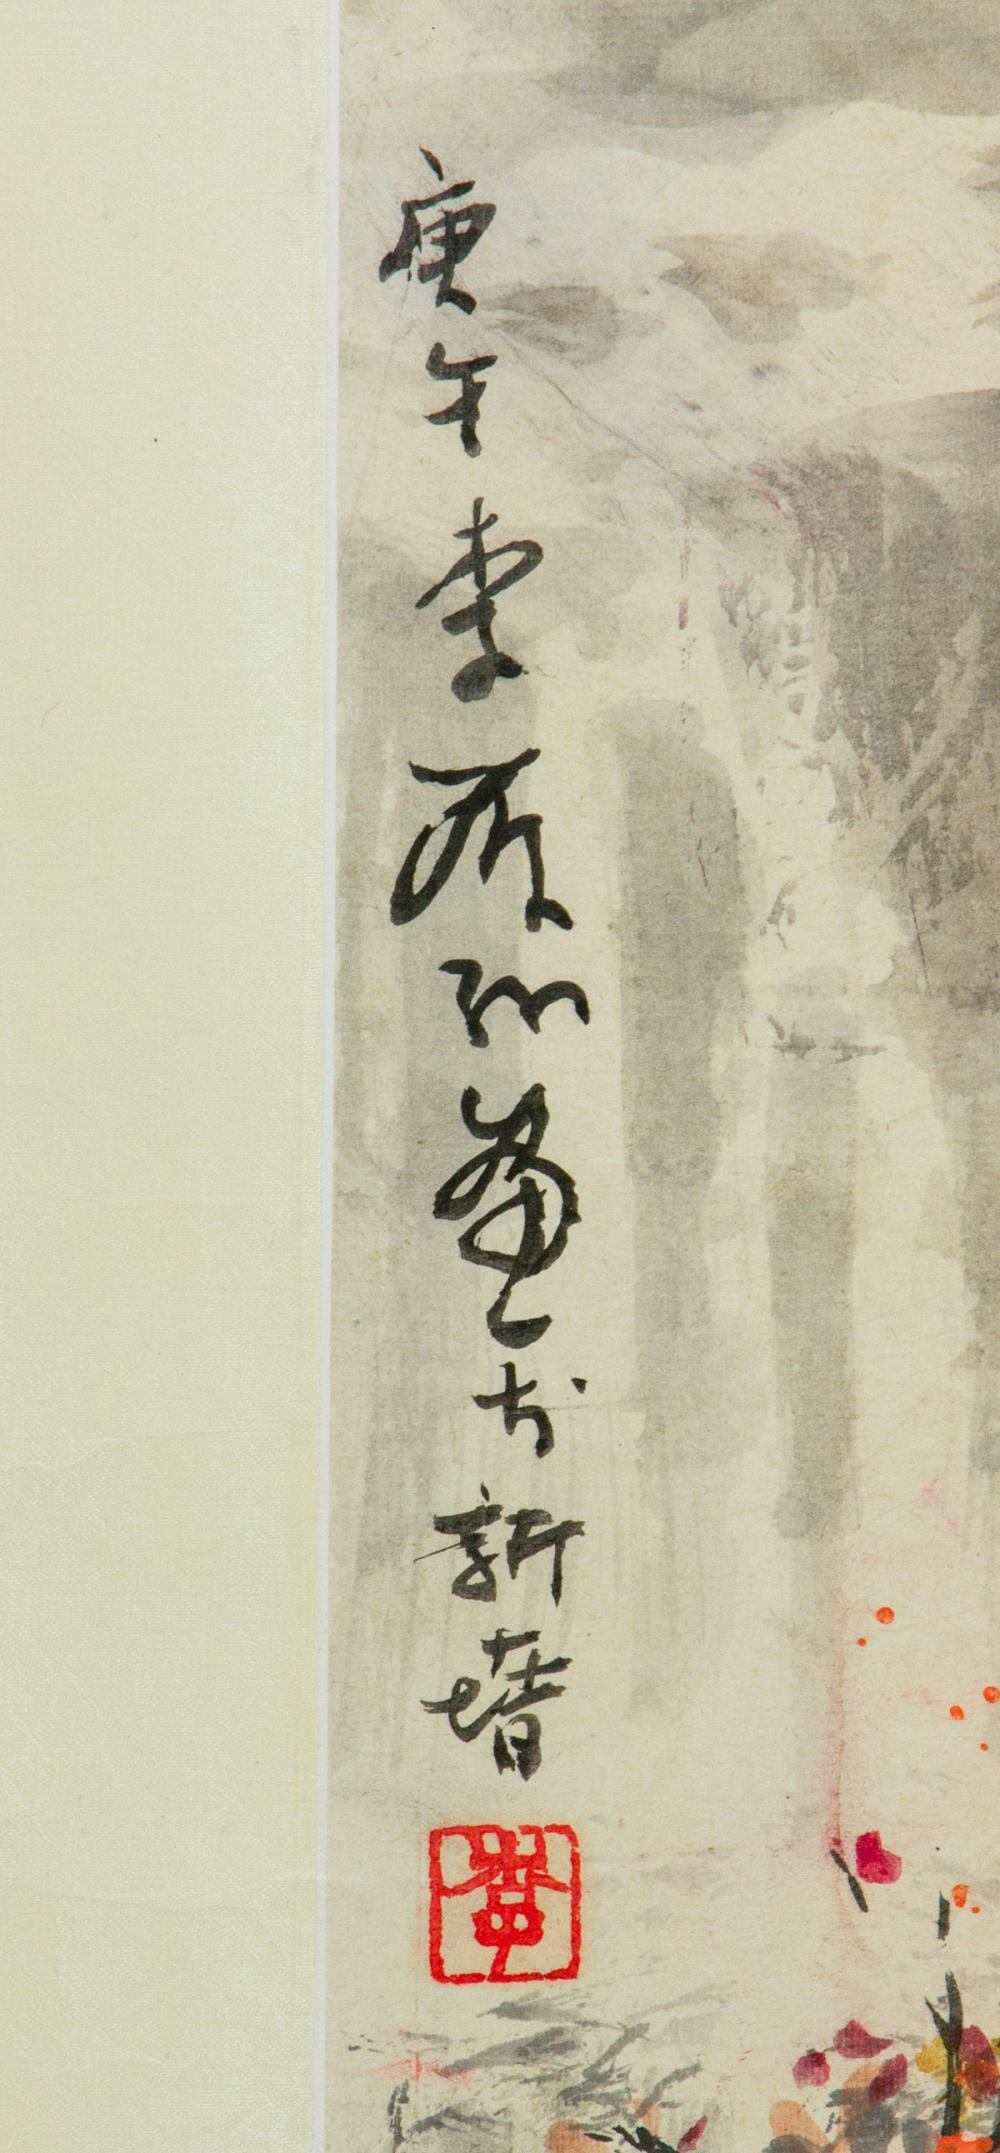 Lot 211: Li Xinchun XX Chinese Watercolor on Paper Roll